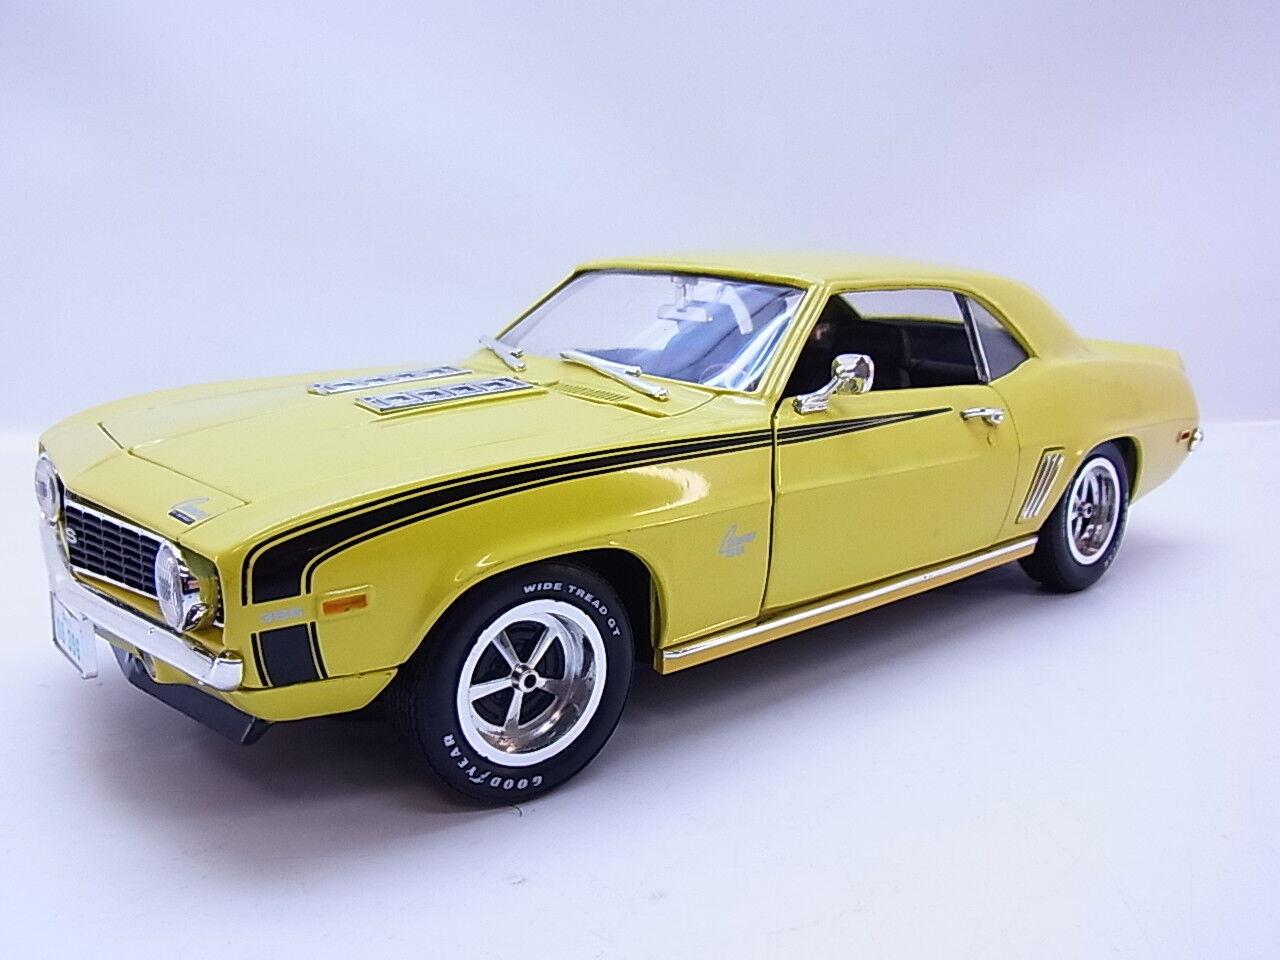 LOT 48357 Ertl GM Chevrolet Camaro SS 1969 gelb US-Car Die-Cast-Modelauto 1 18